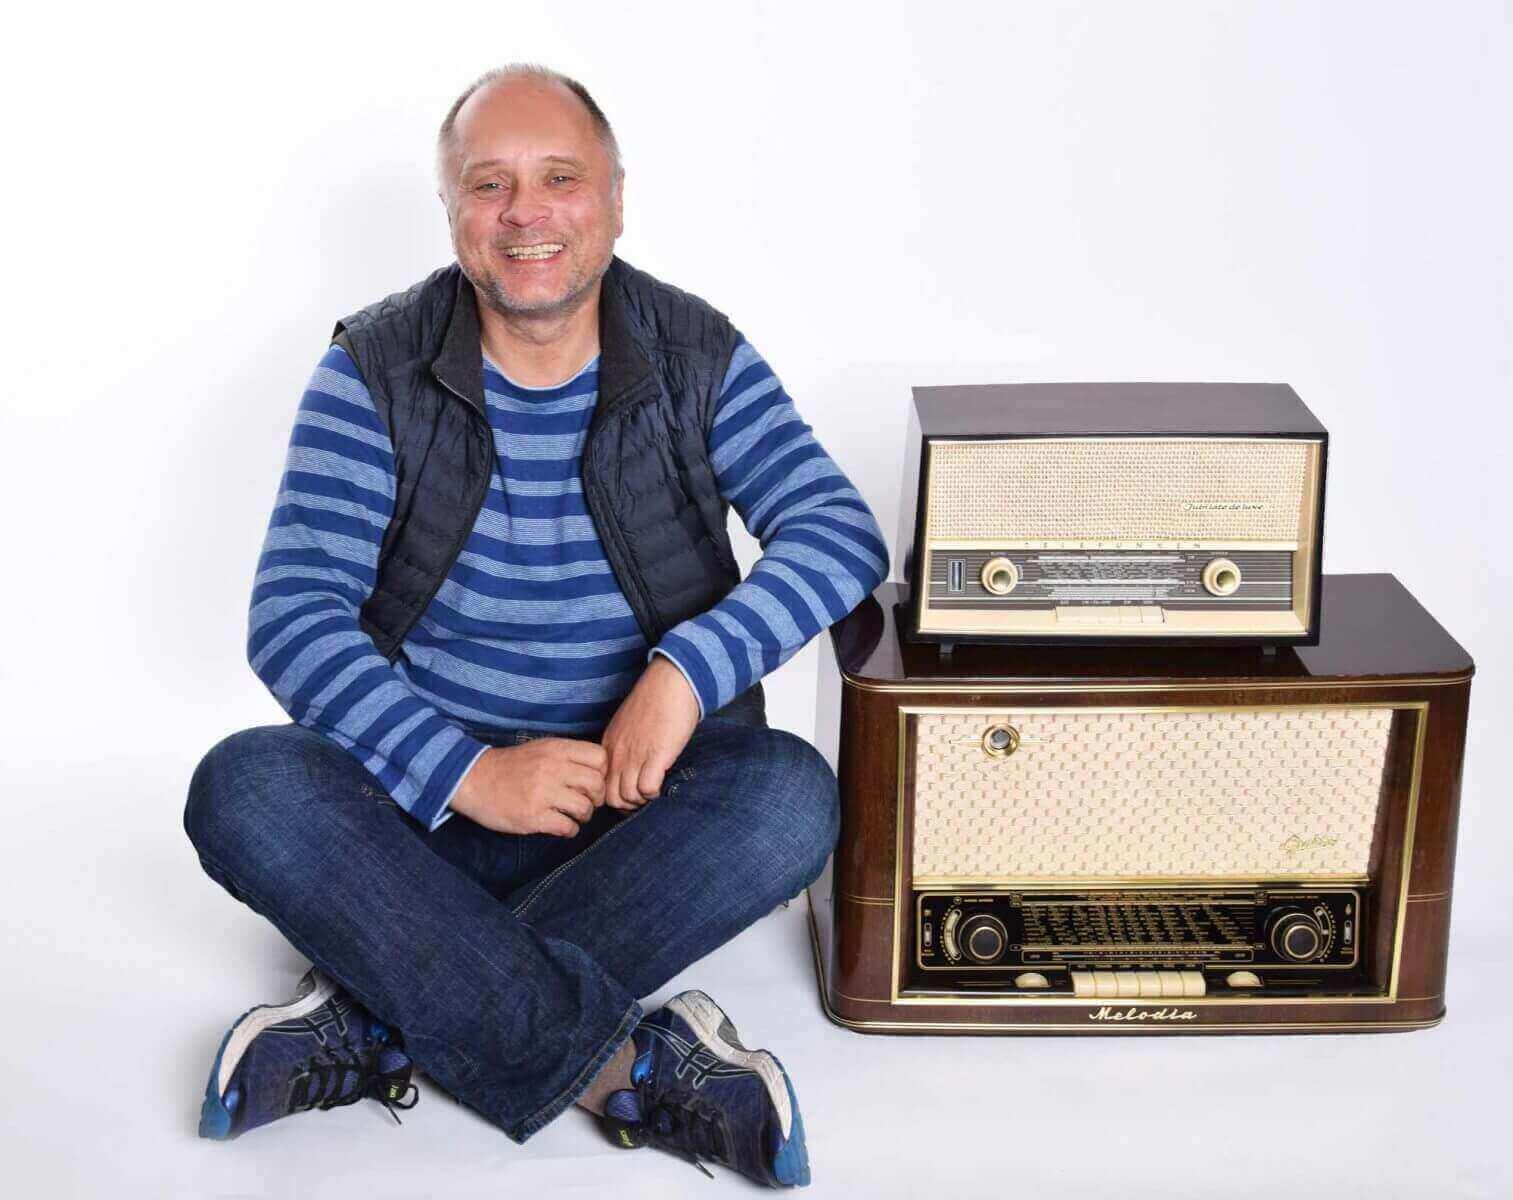 Detlef Vangerow mit Röhrenradios